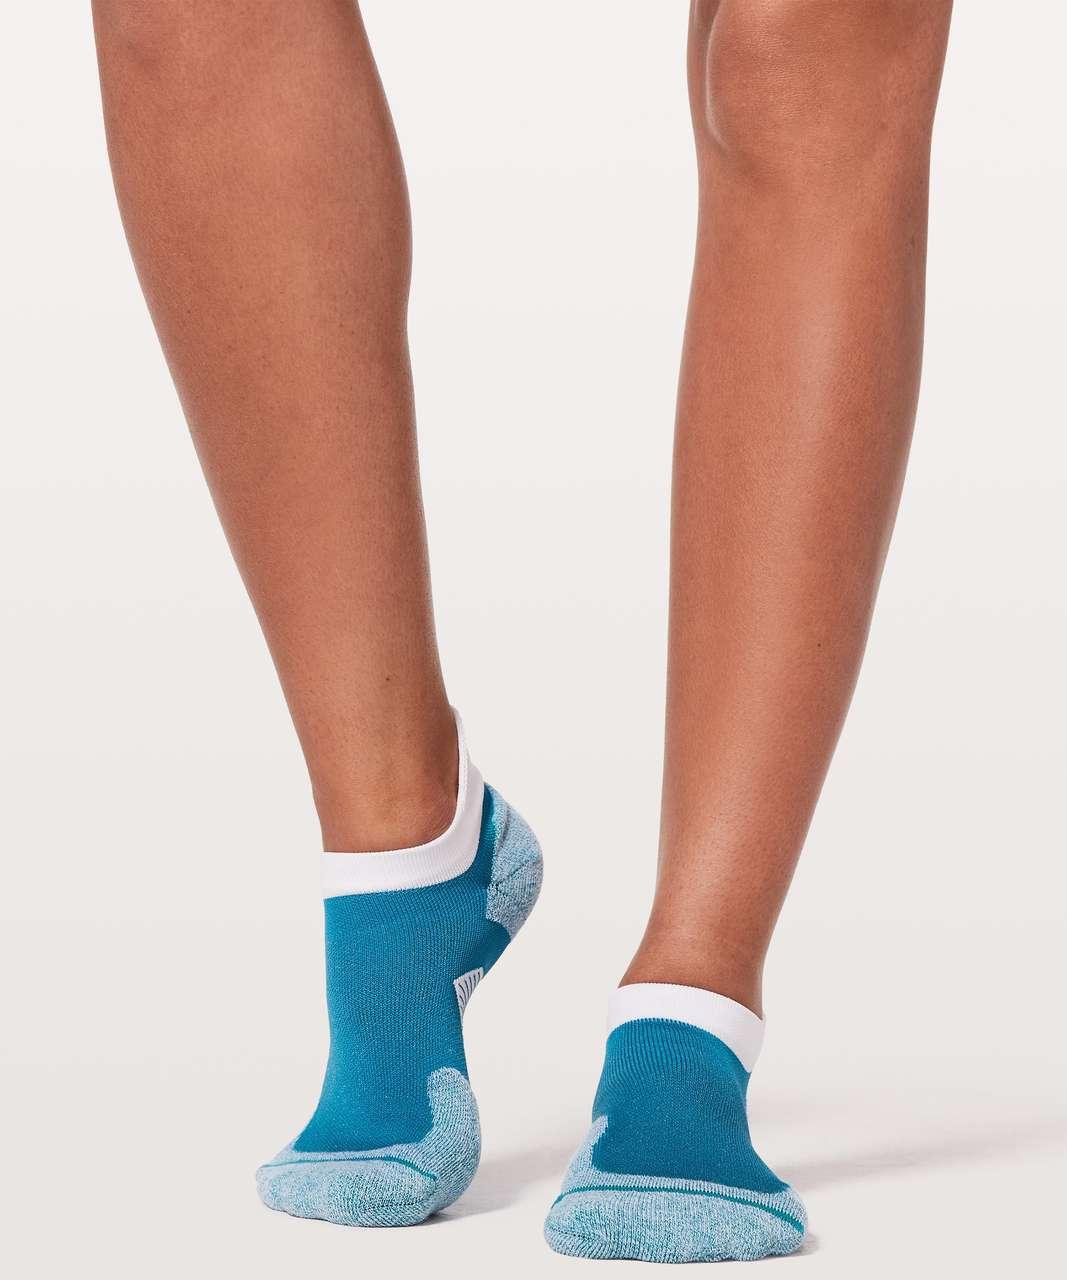 Lululemon Speed Sock *Silver - Teal Blue / White